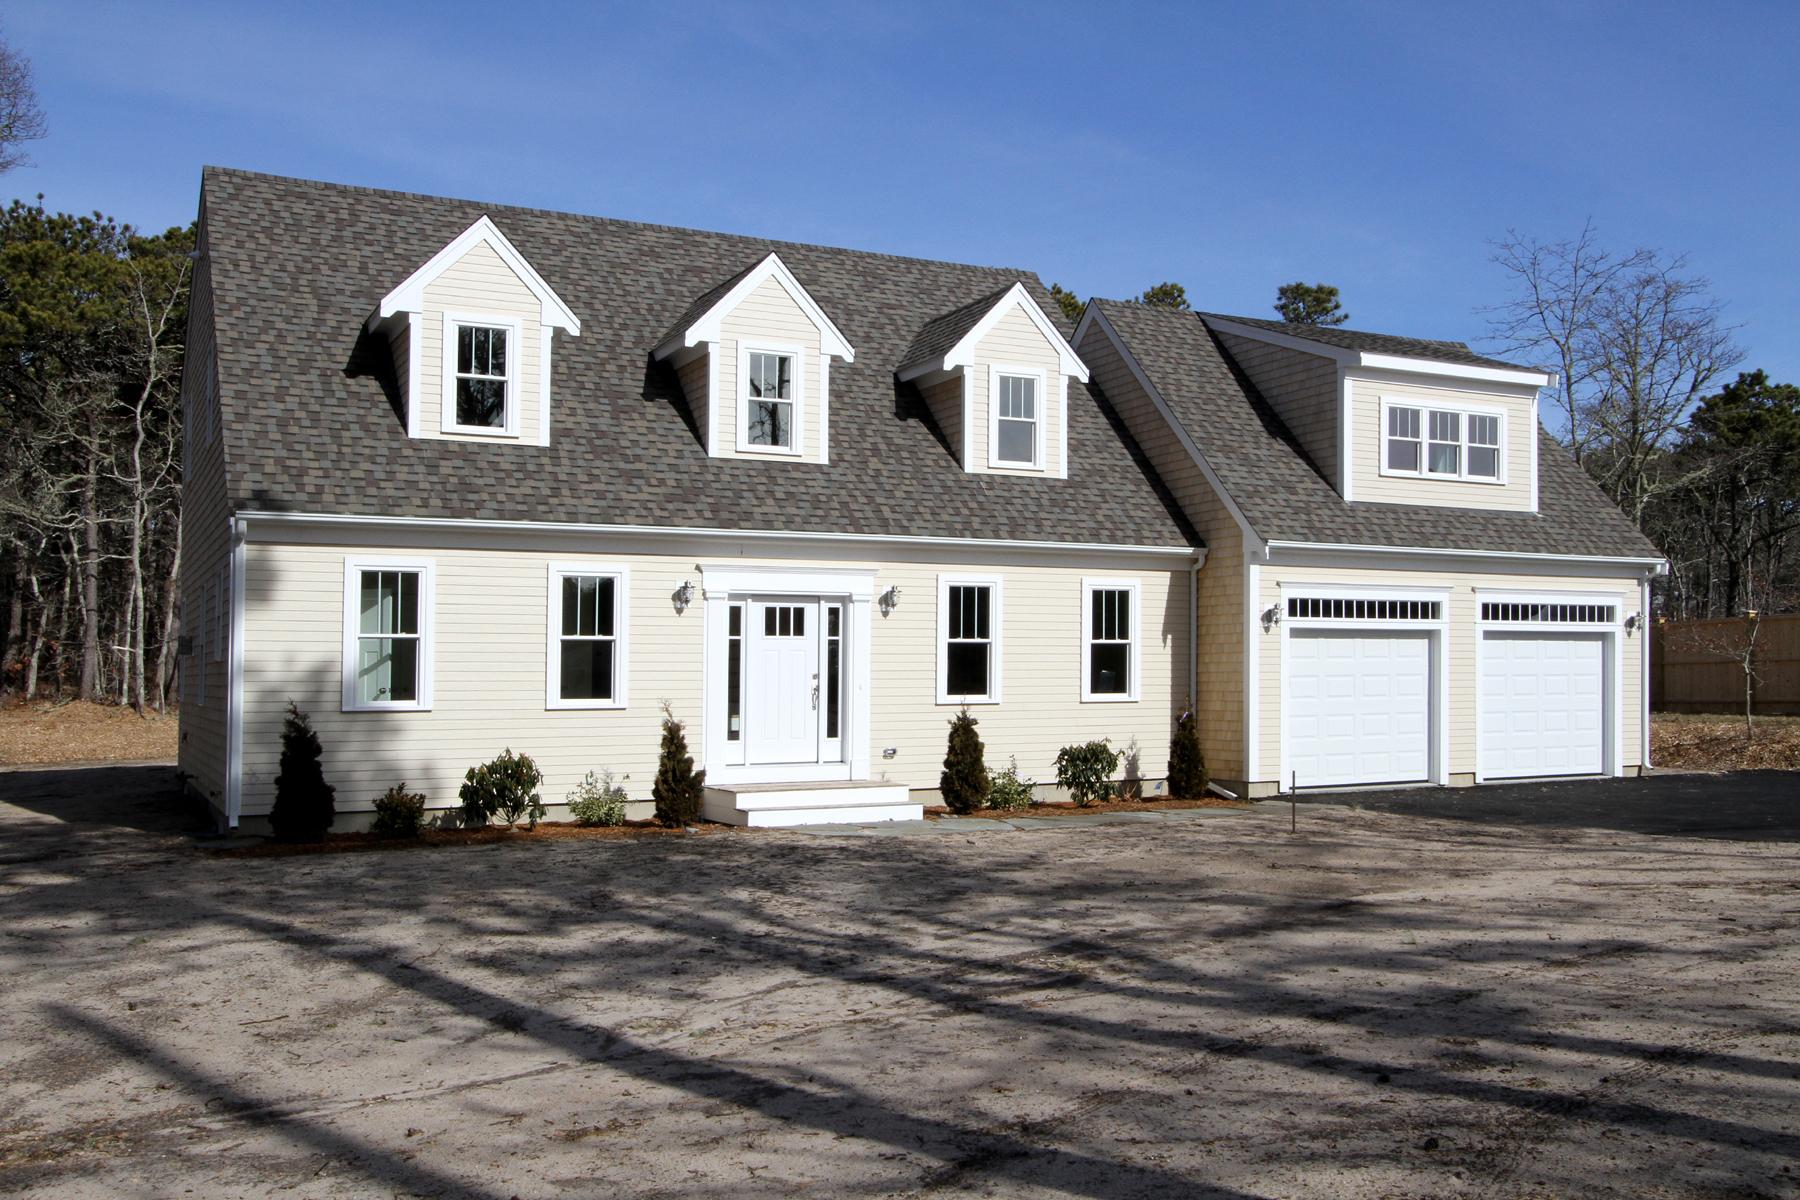 sales property at 150 Long Road, Harwich, MA